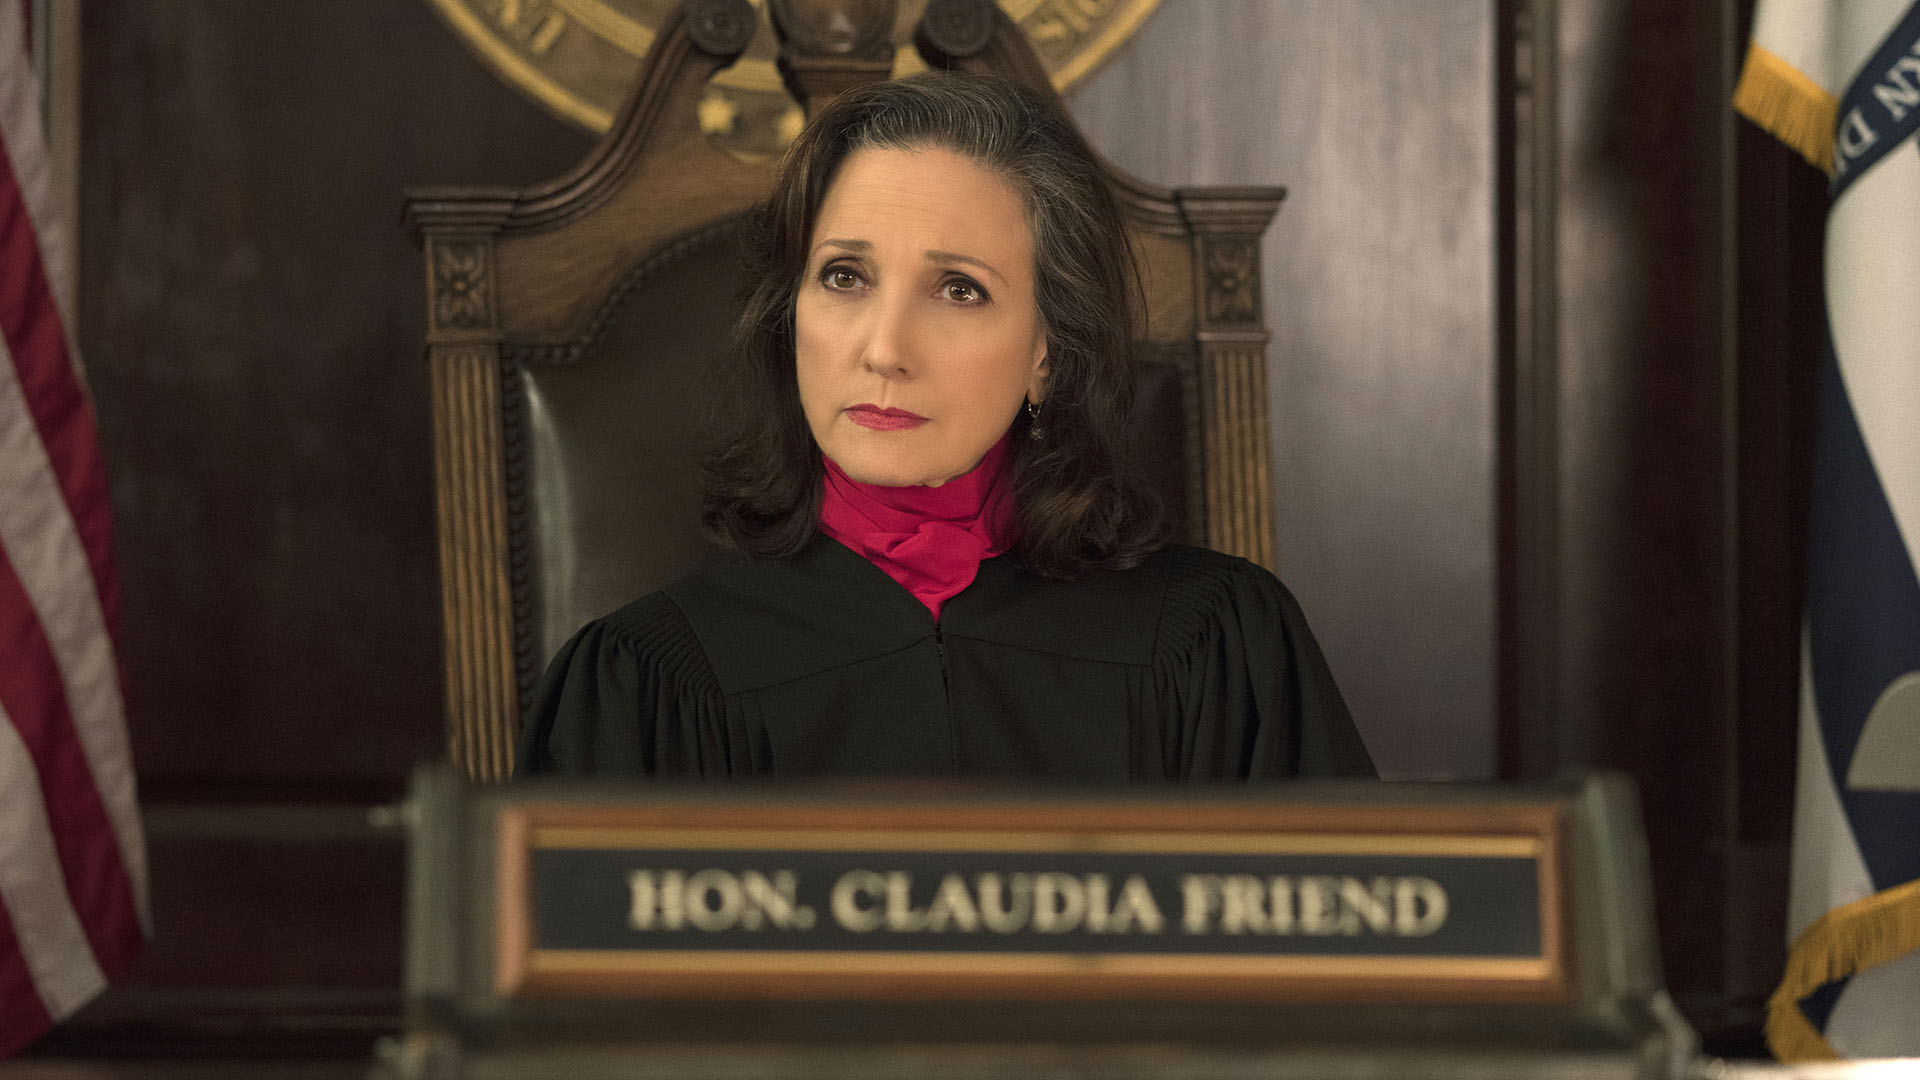 Bebe Neuwirth as Judge Claudia Friend